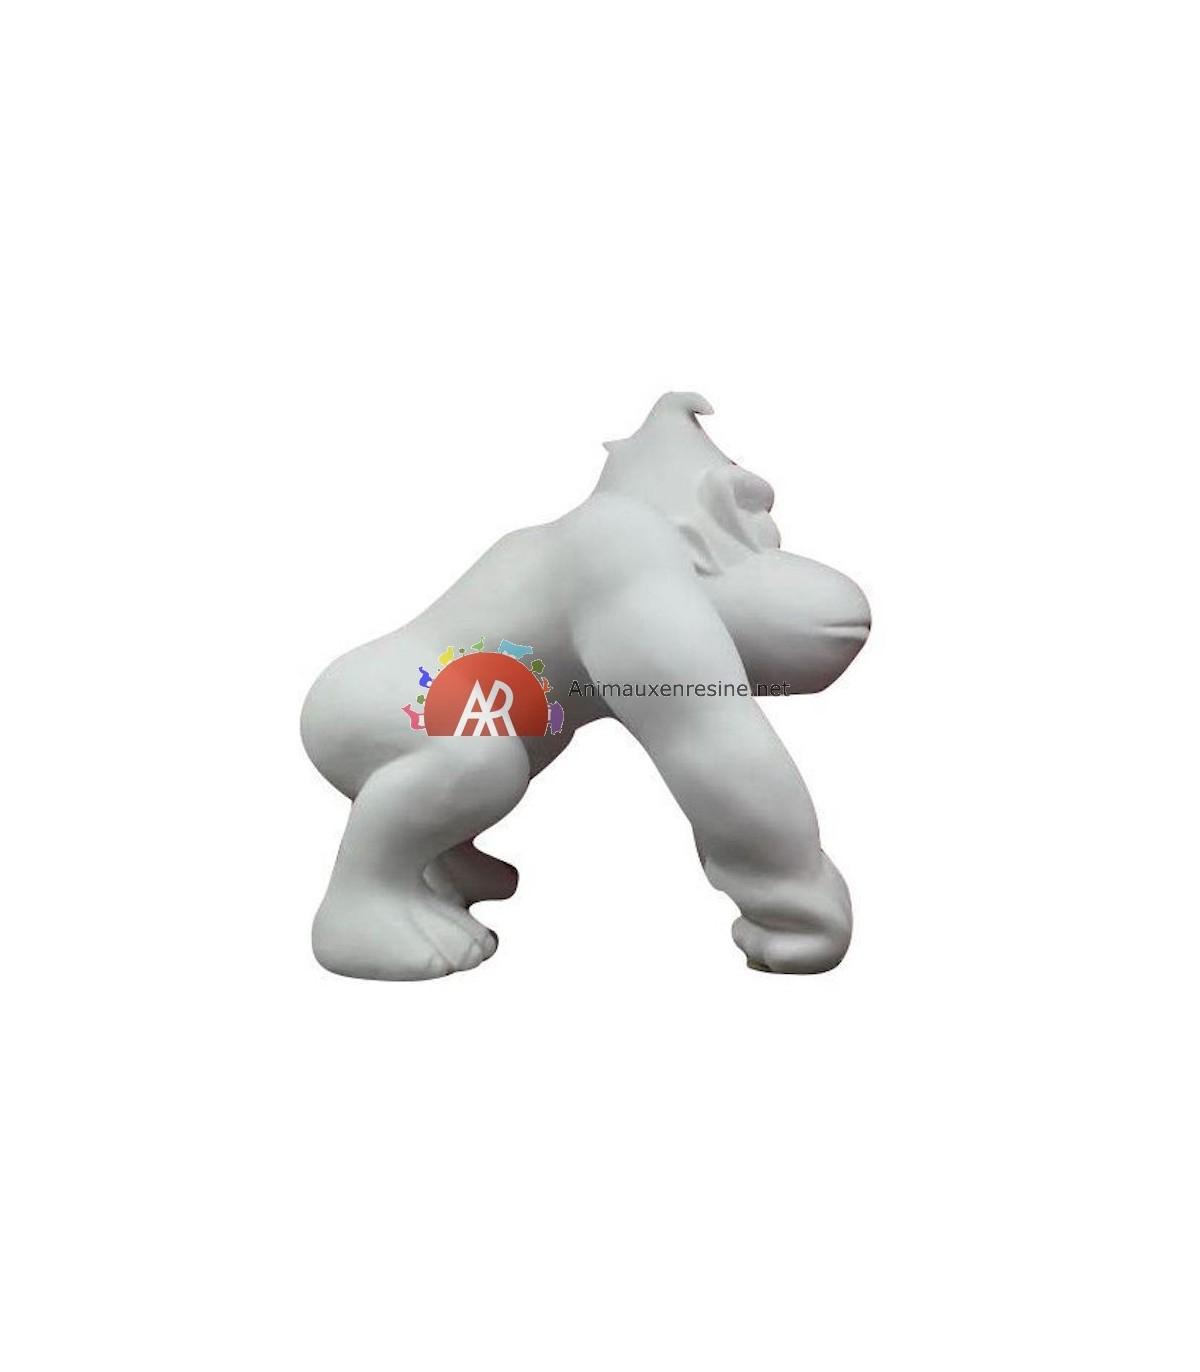 Statue Donkey Kong Grand Modèle En Résine Monochrome serapportantà Nain De Jardin Fuck